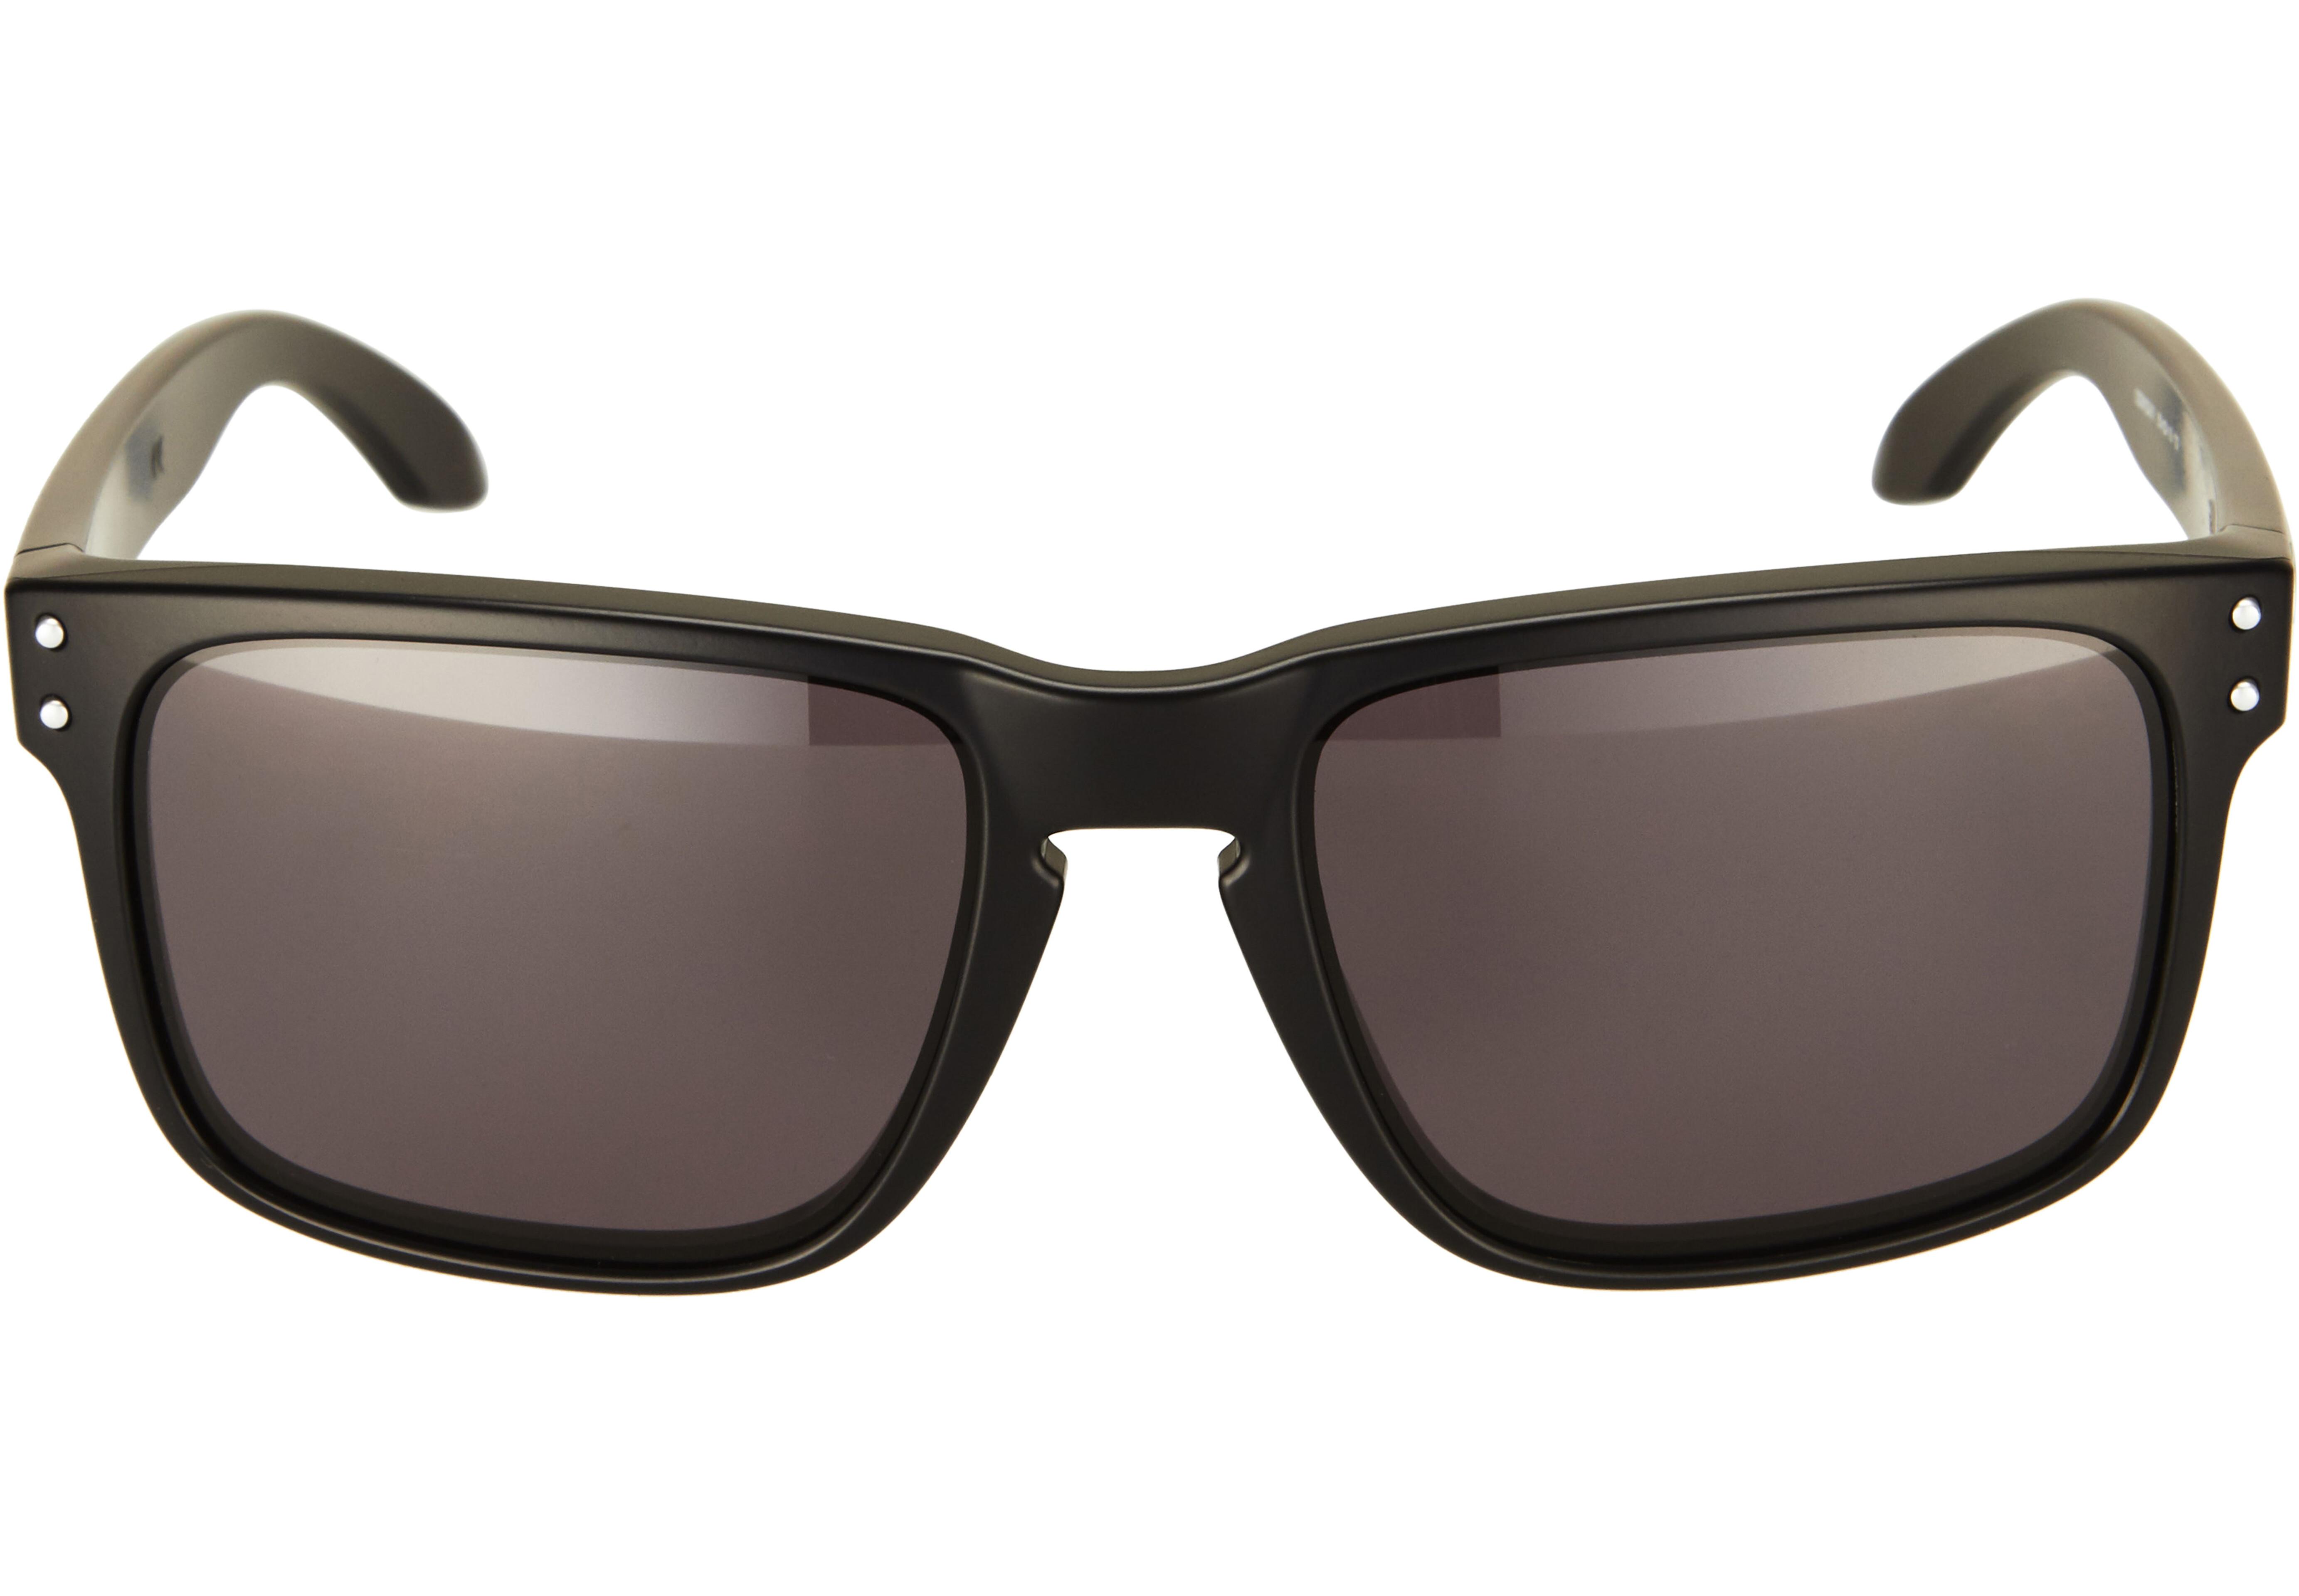 0bde5860d4 Download Image 5530 X 3840. oakley holbrook matte black warm grey sunglasses  oakleysunglassesuk.ru oakley holbrook matte ...